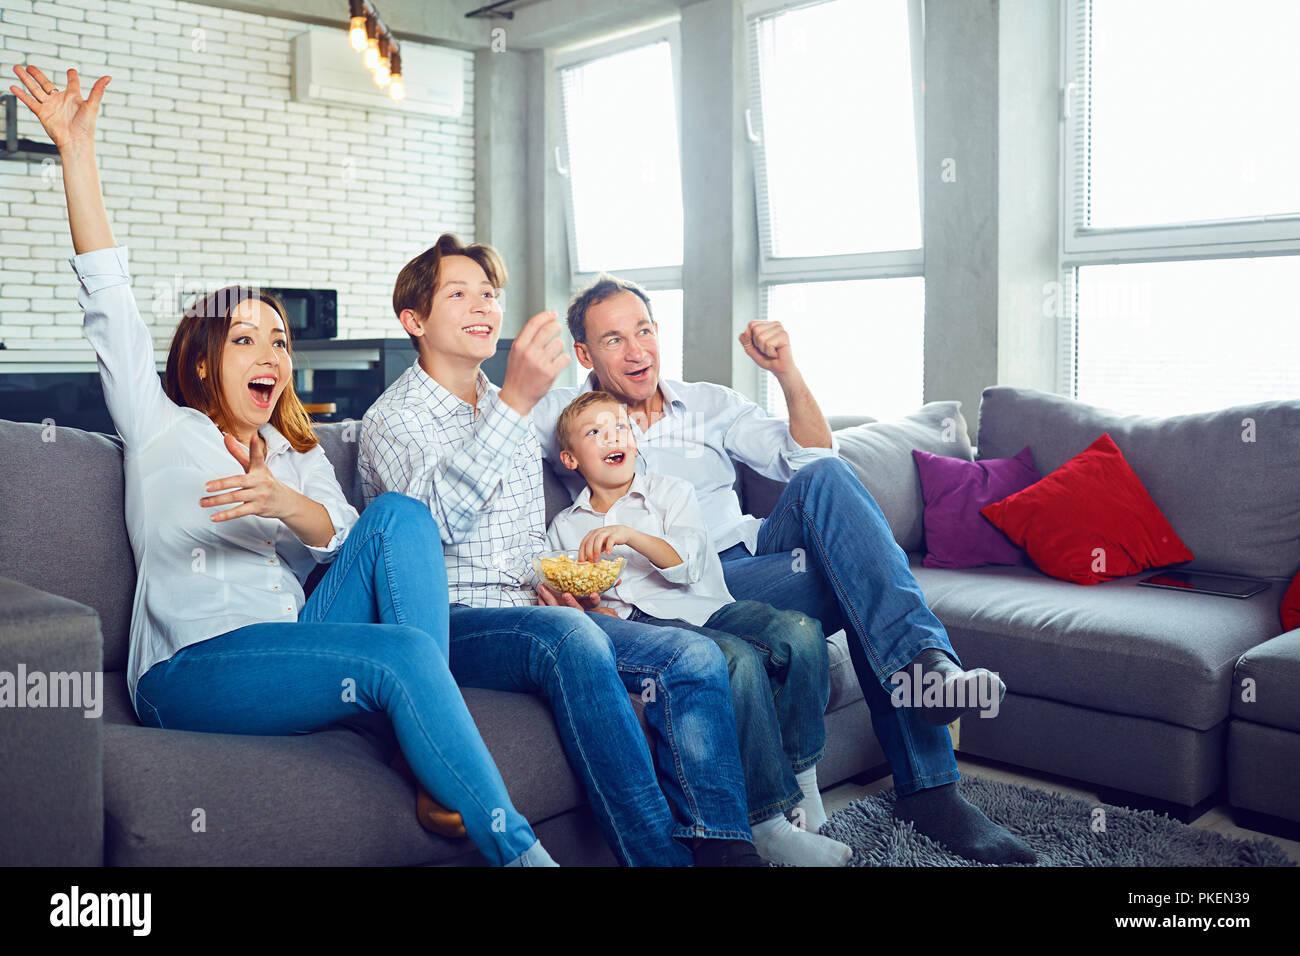 Happy family having fun watching TV sitting. - Stock Image